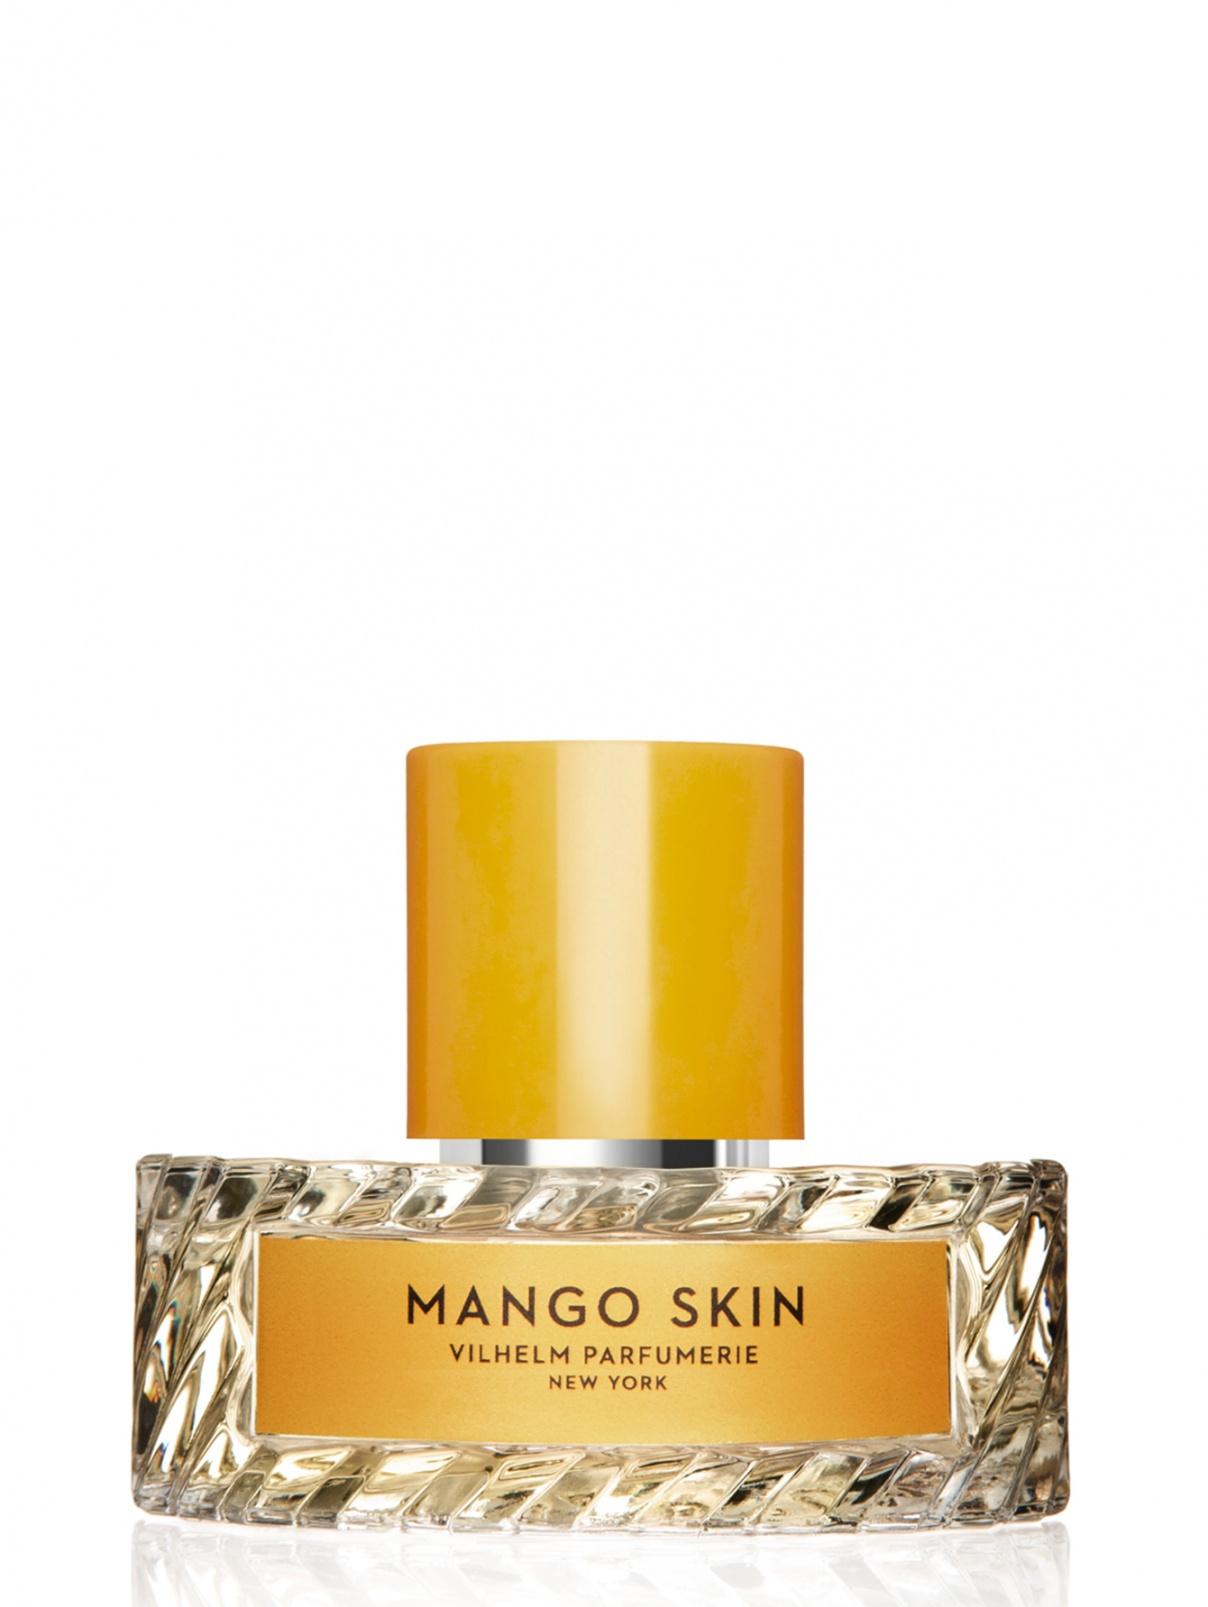 Парфюмерная вода Mango Skin 50 мл Vilhelm Parfumerie  –  Общий вид